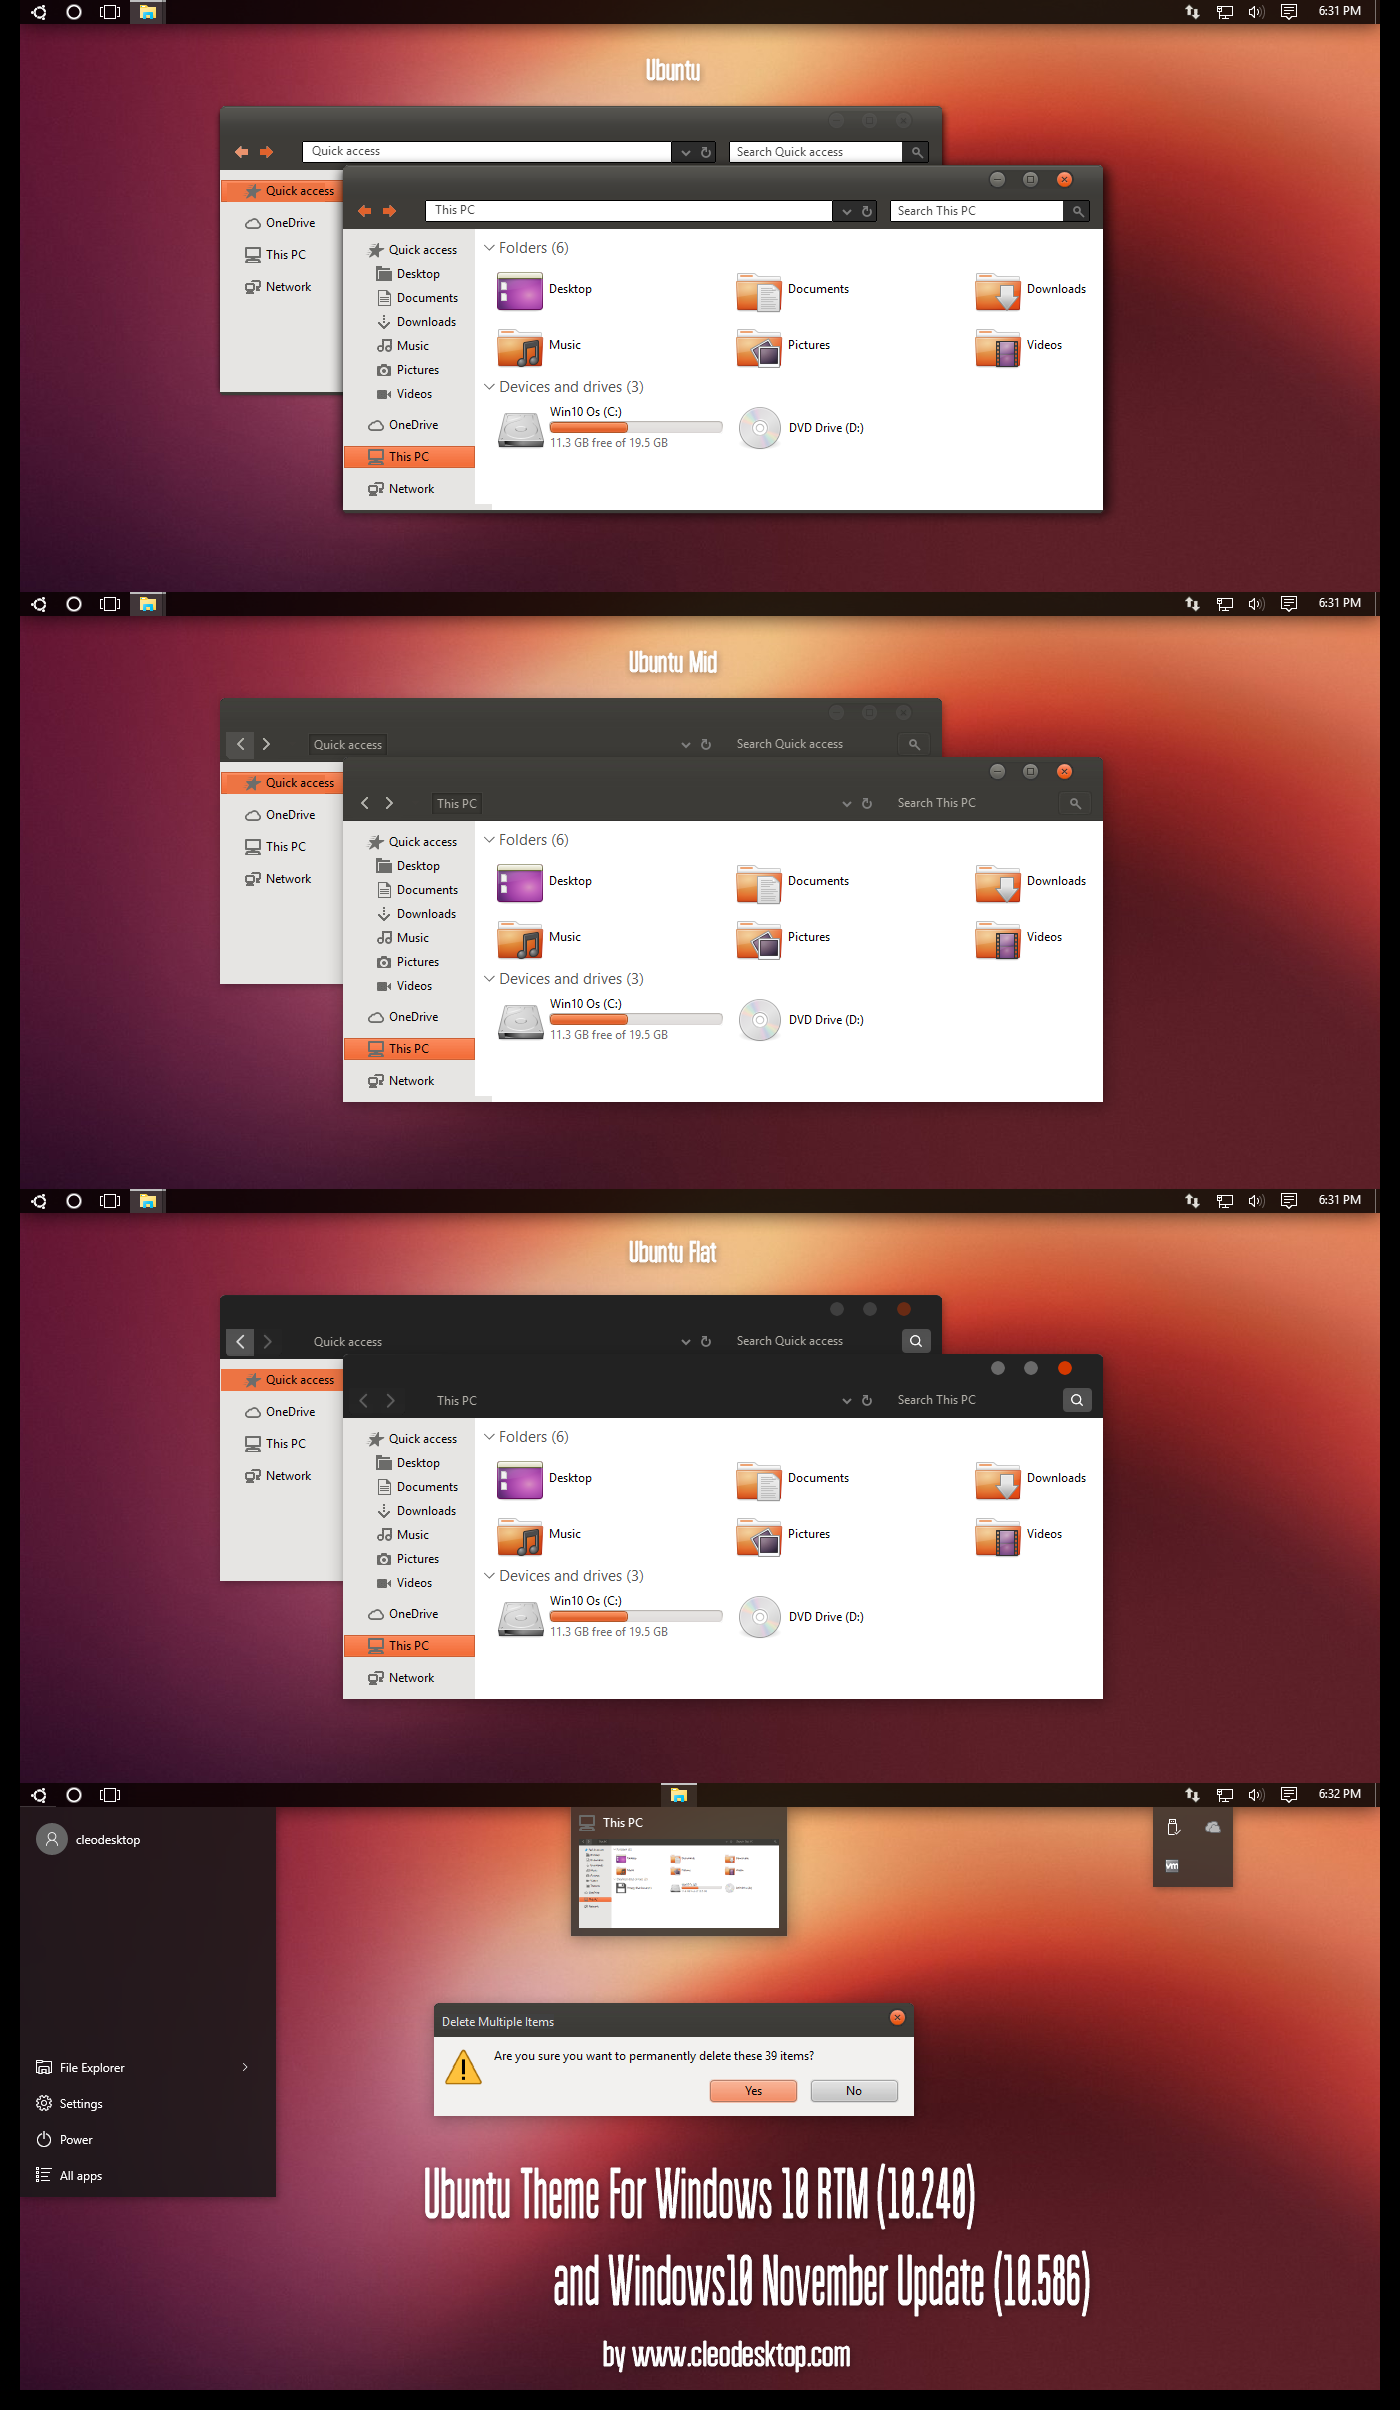 ubuntu theme for windows 10 november update by cleodesktop